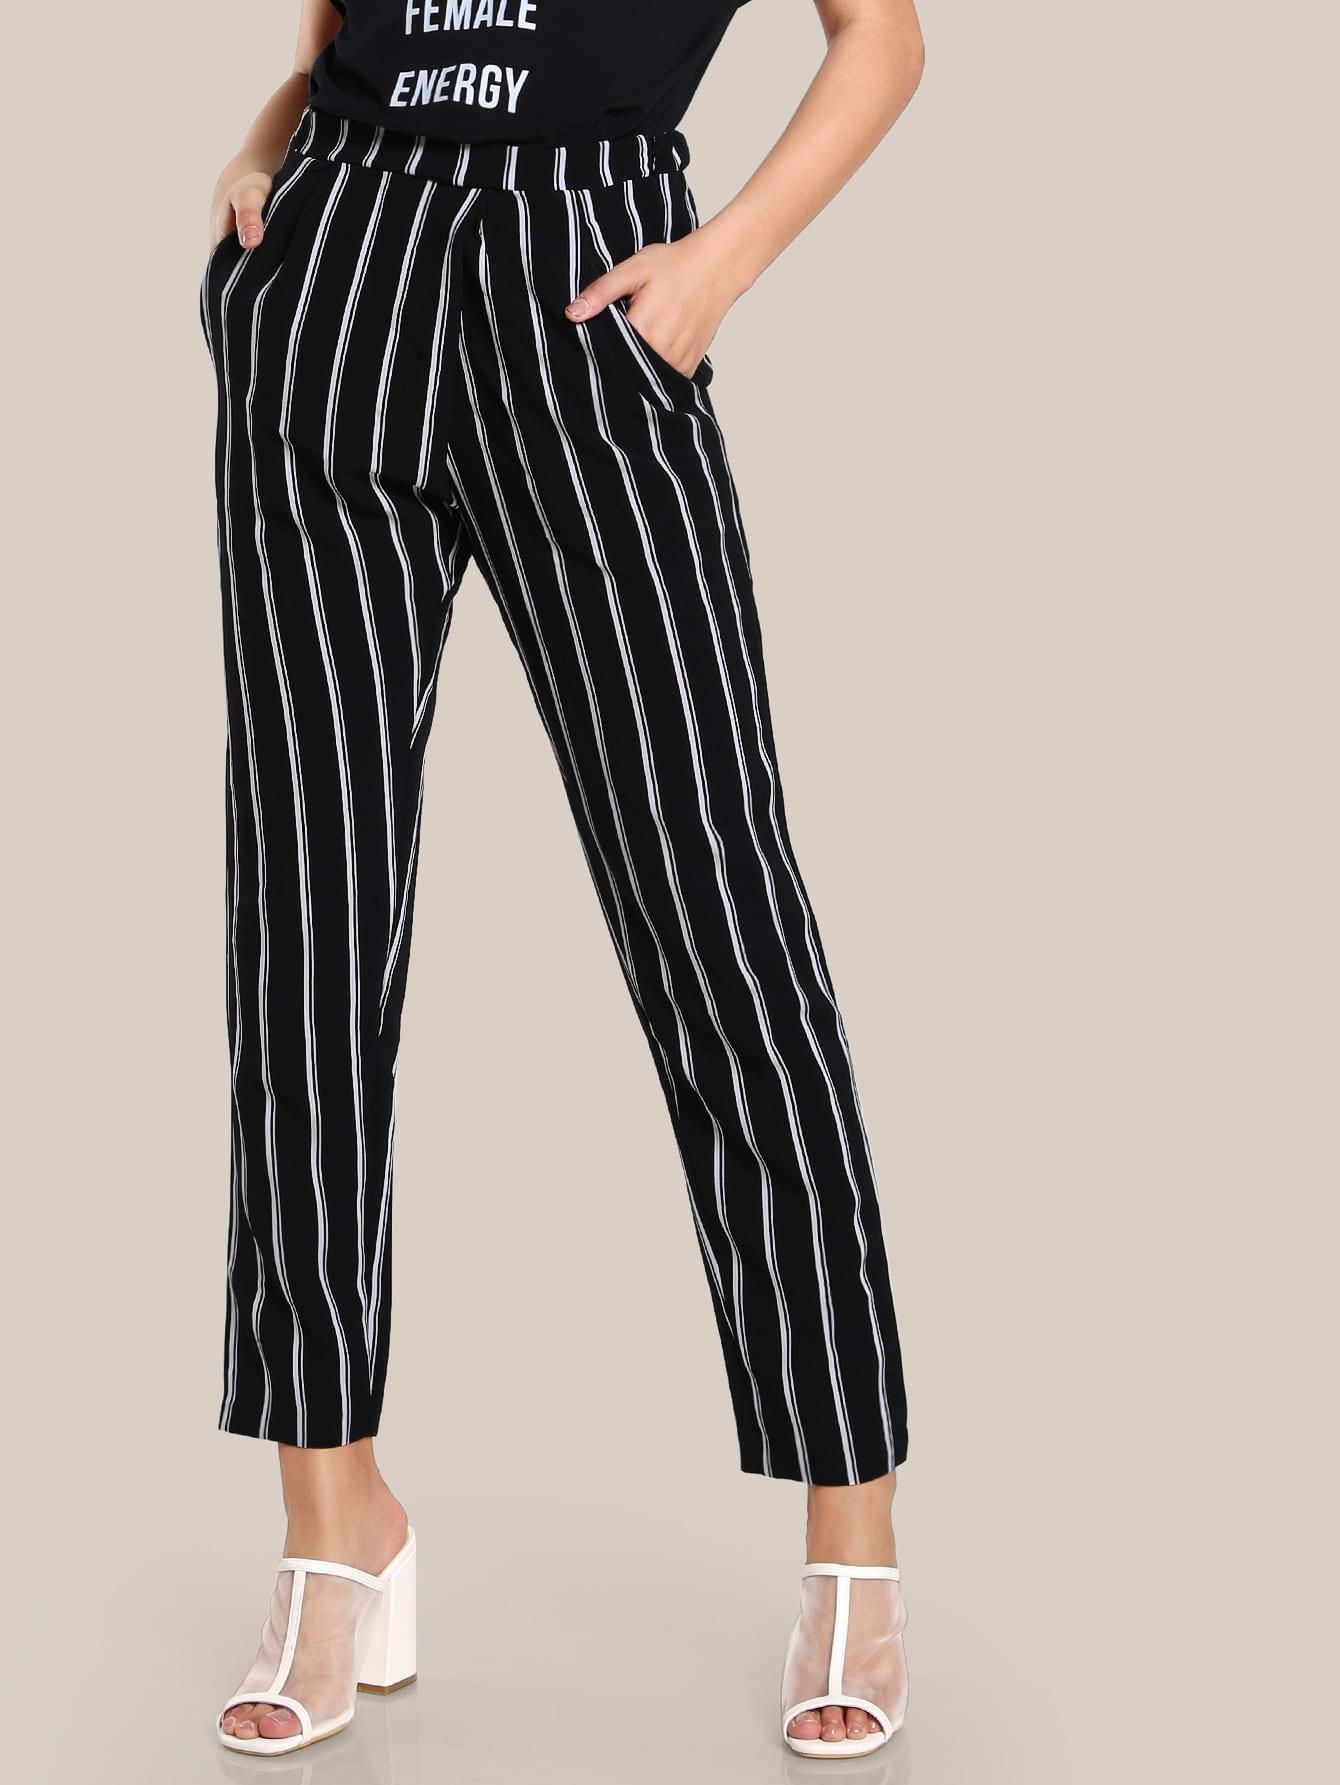 Image of Striped High Rise Peg Pants